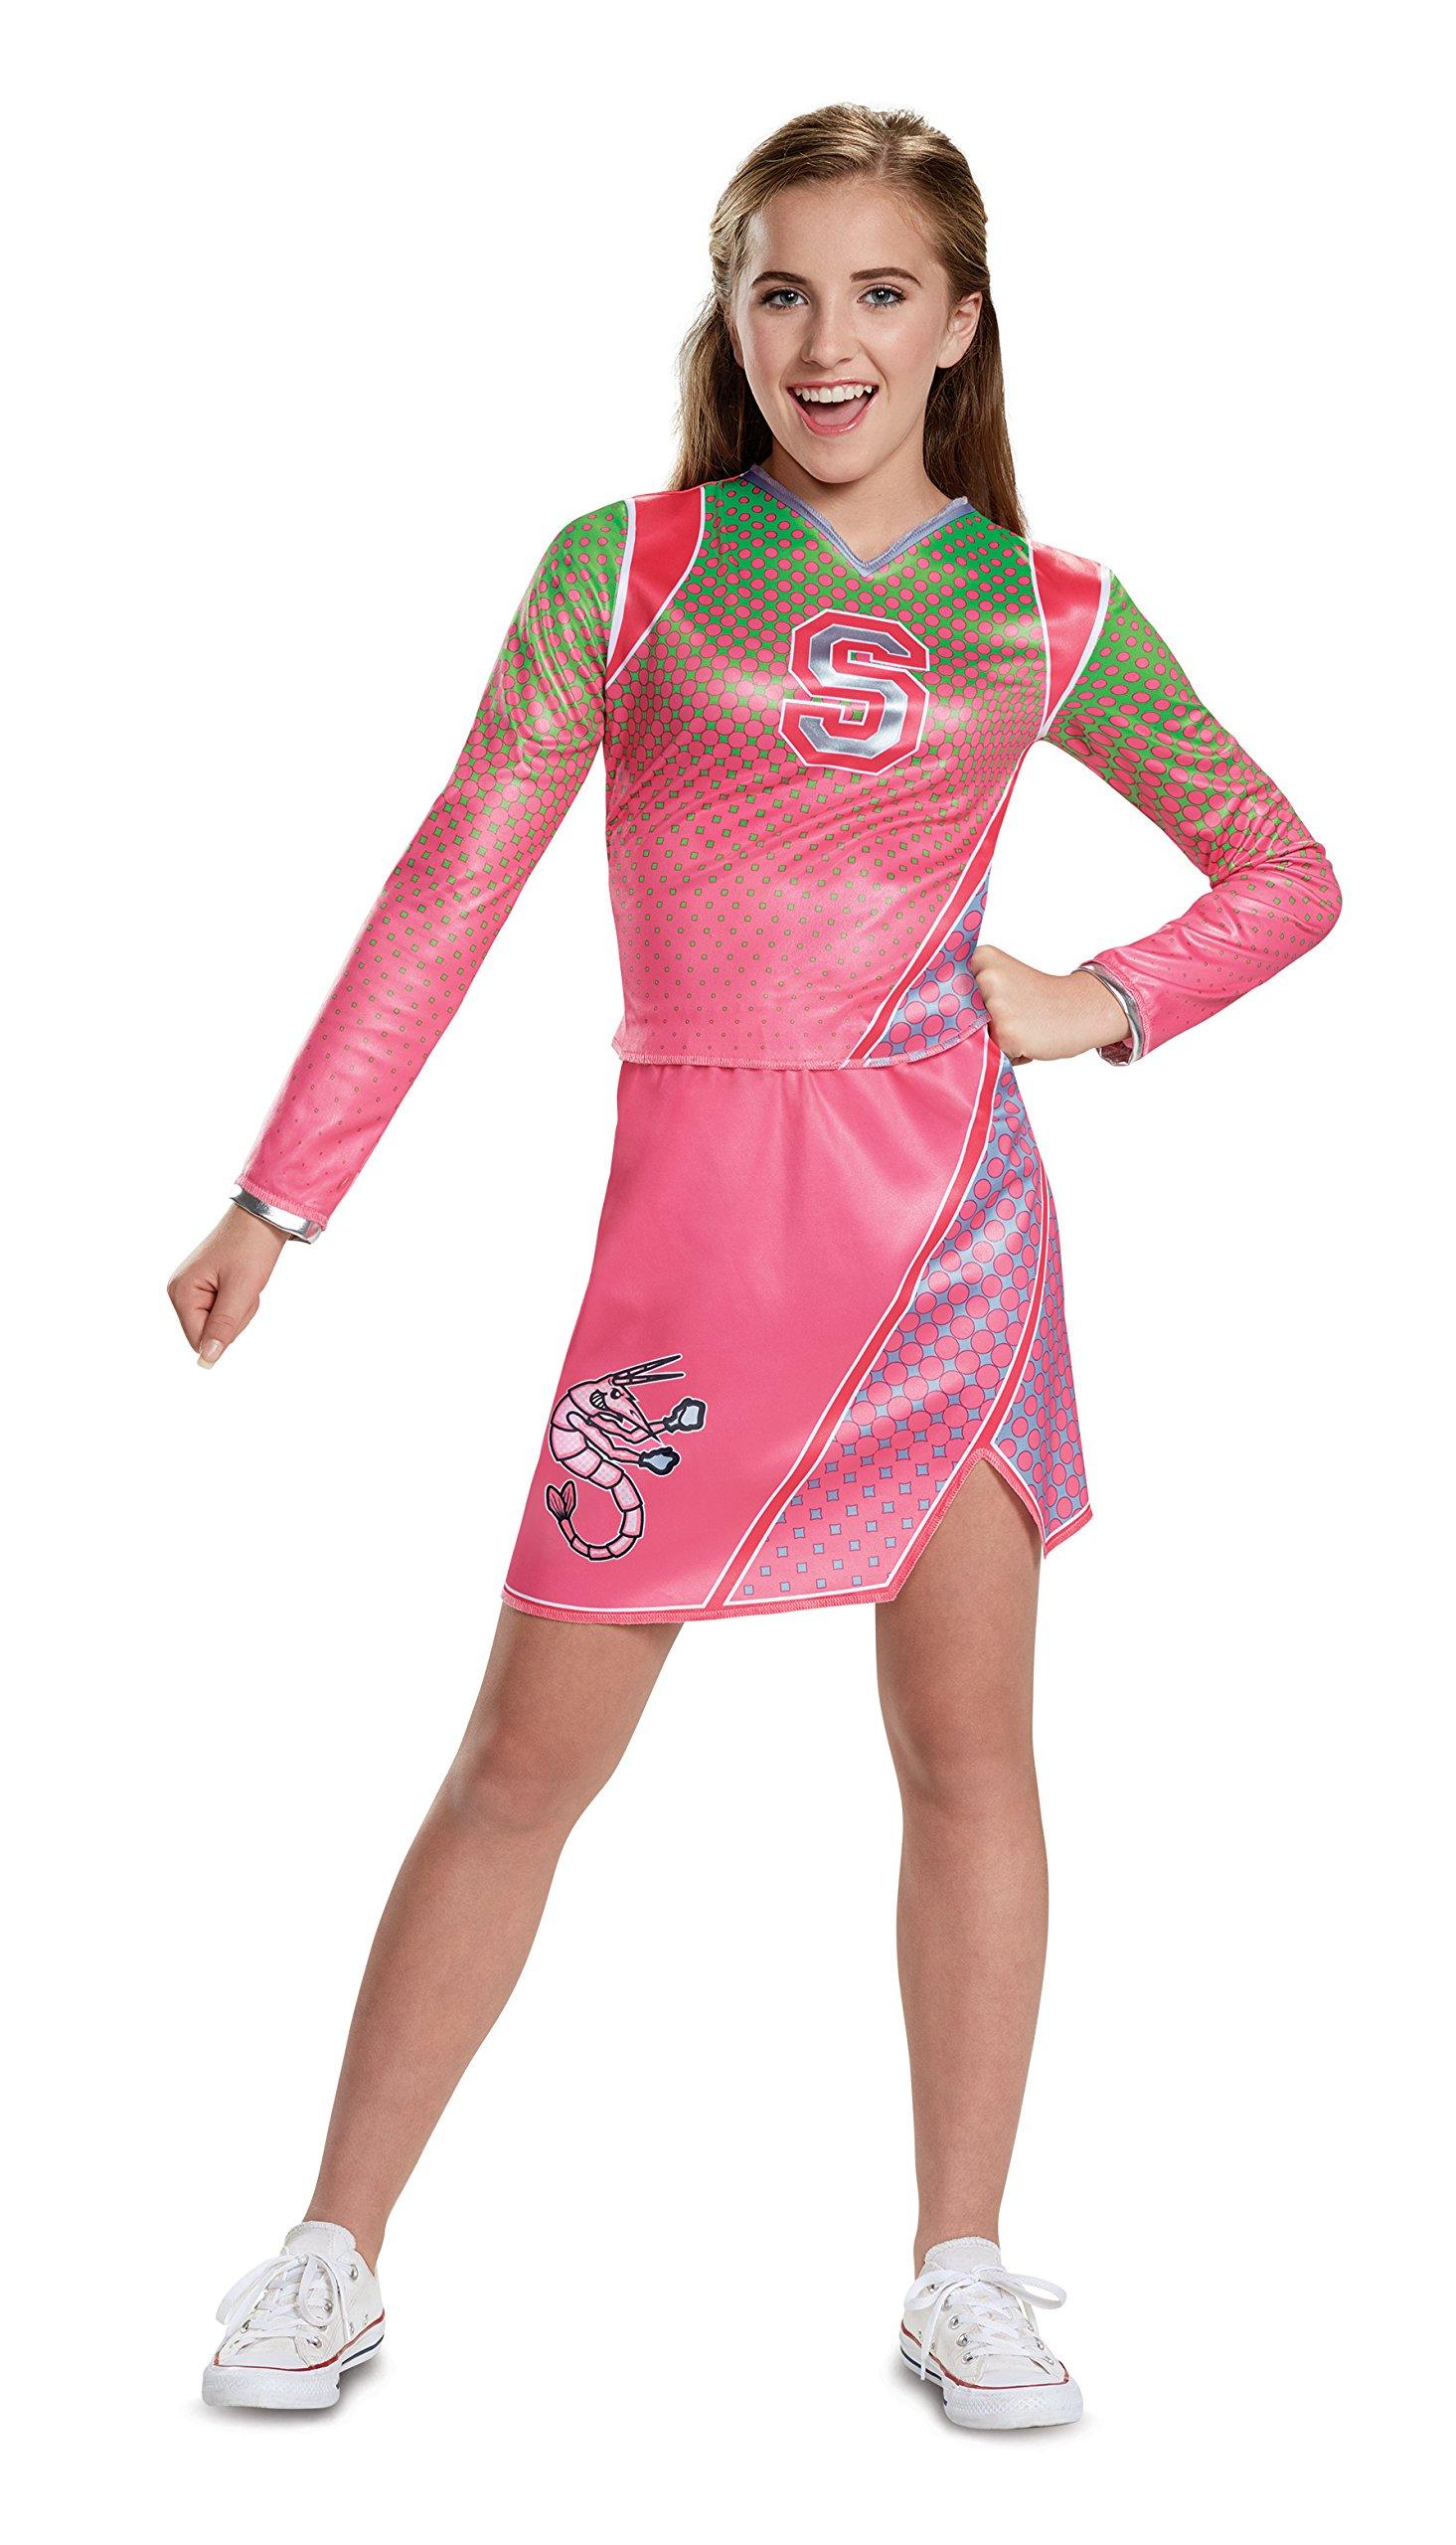 Disguise Addison Classic Cheerleader Child Costume, Pink, Medium/(7-8)